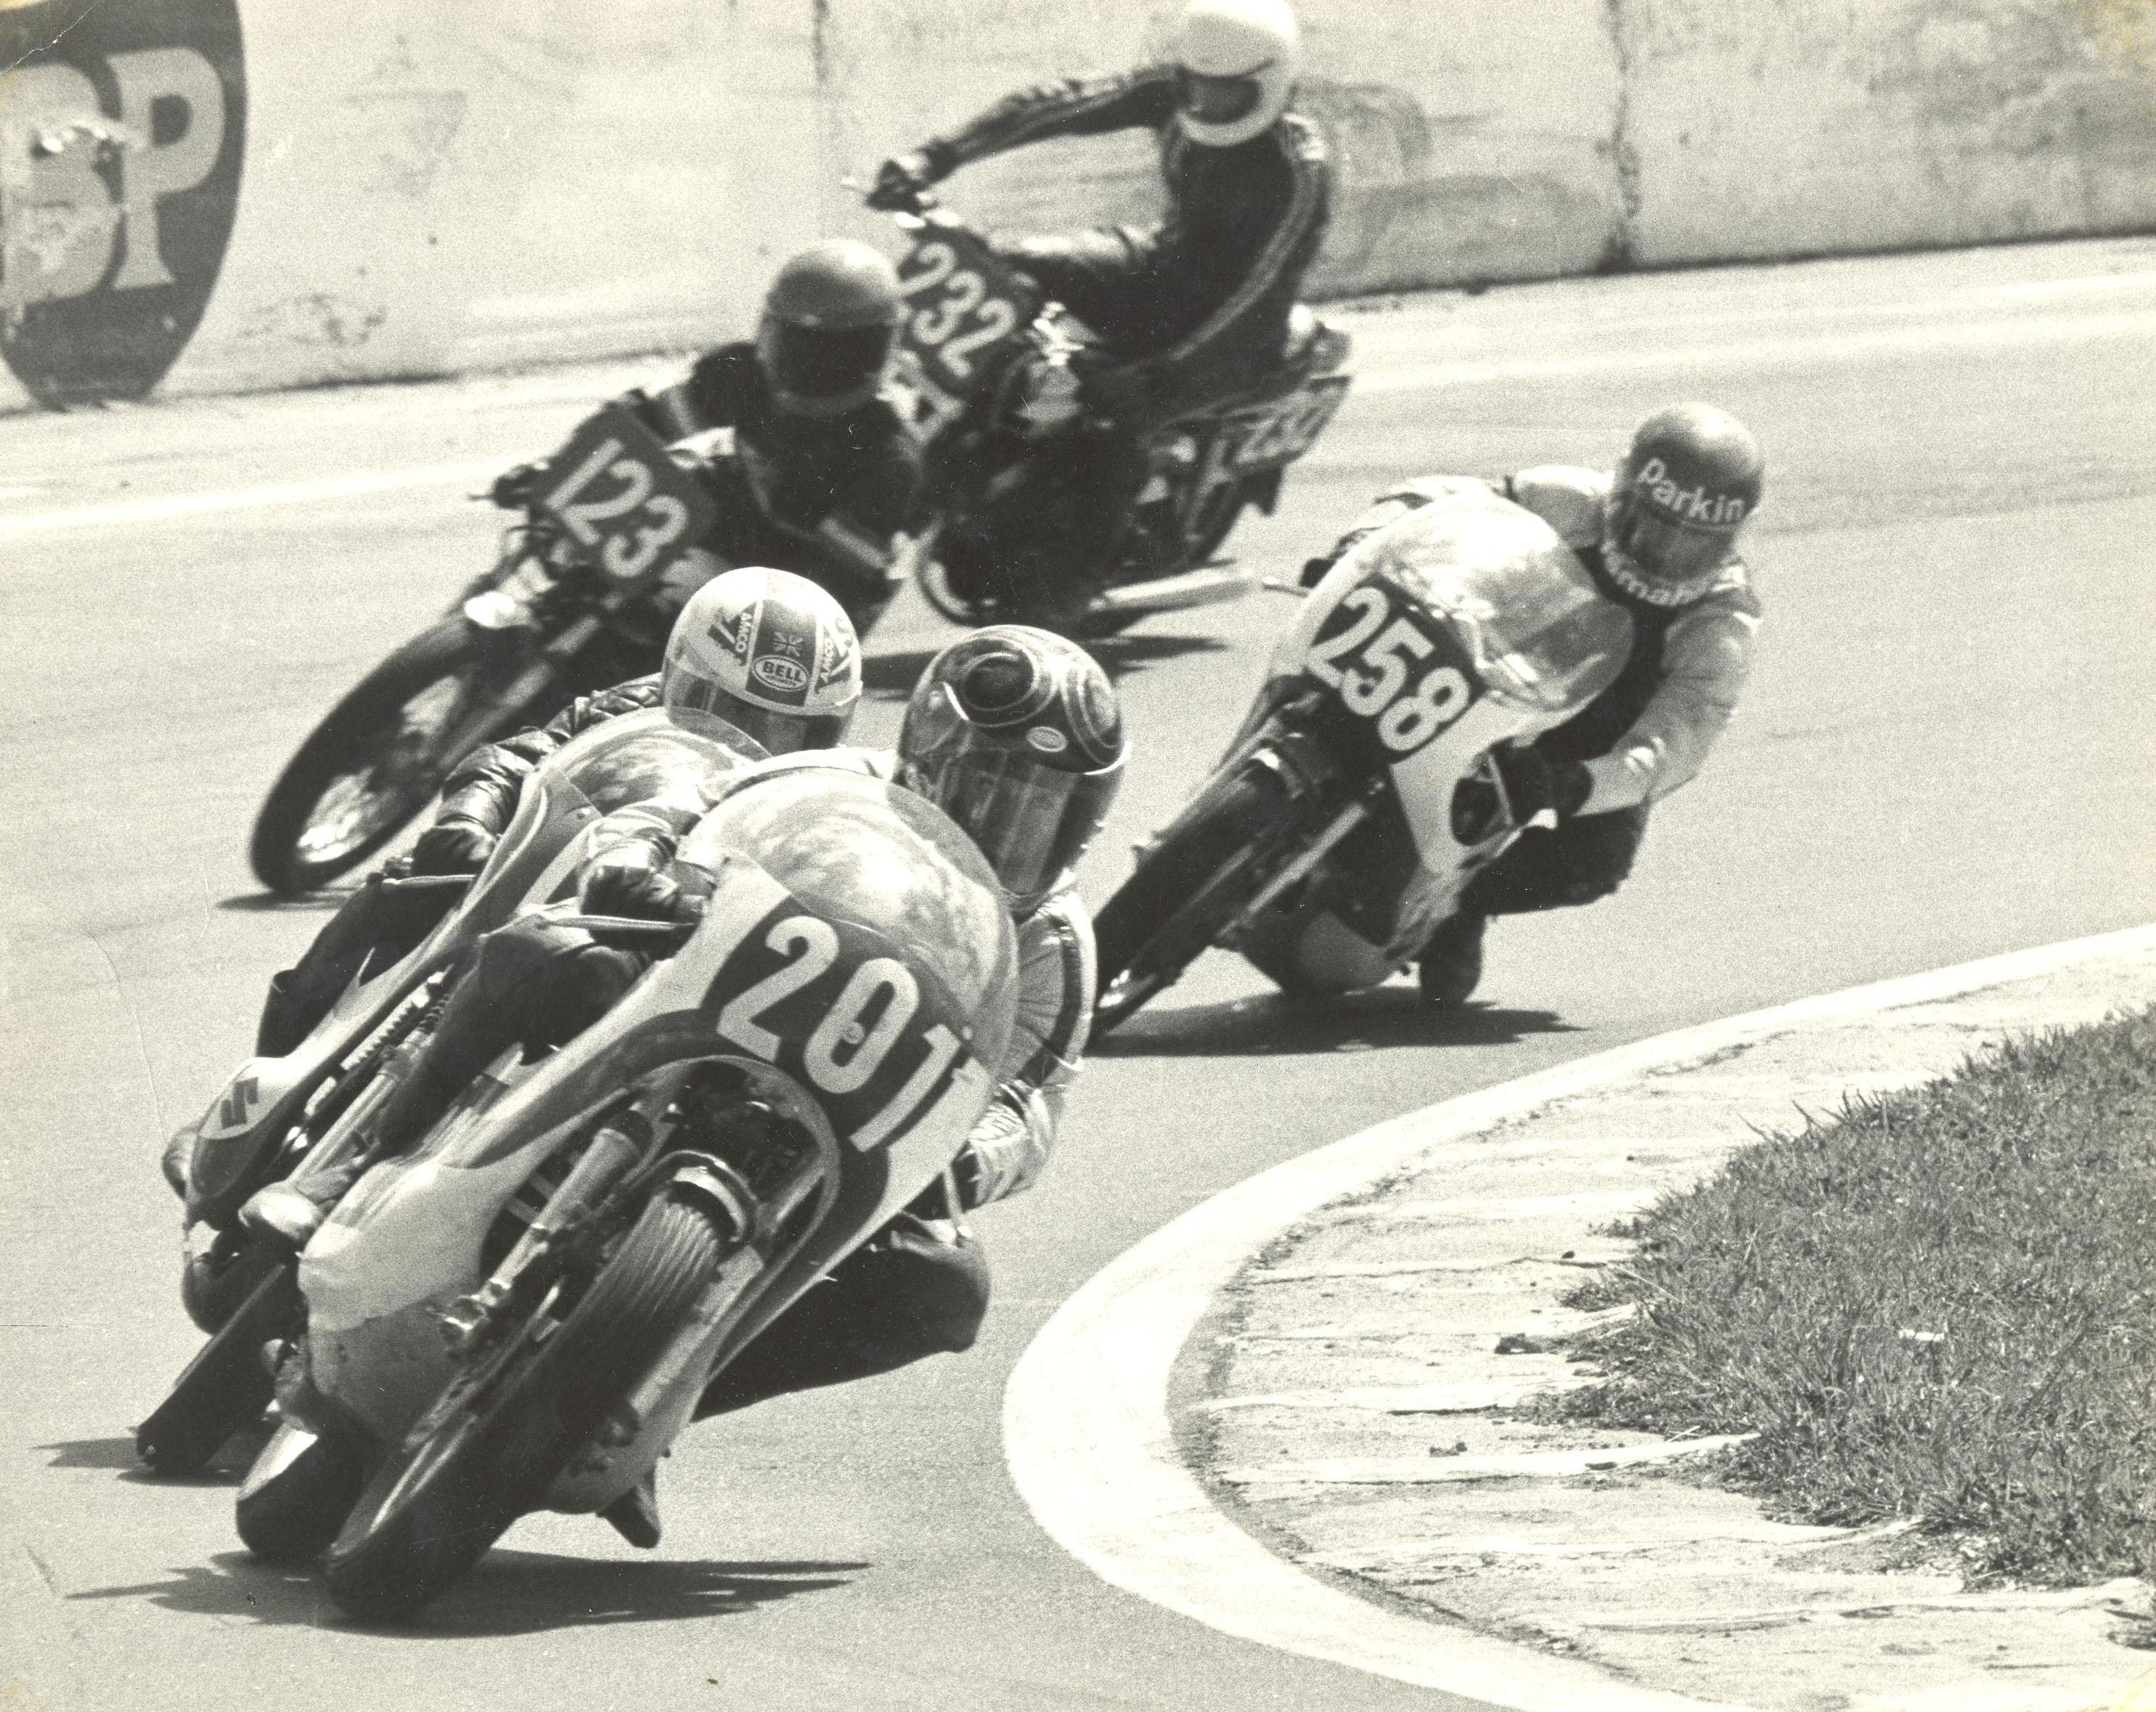 1974 Lee and Jeff Parkin (No.258)